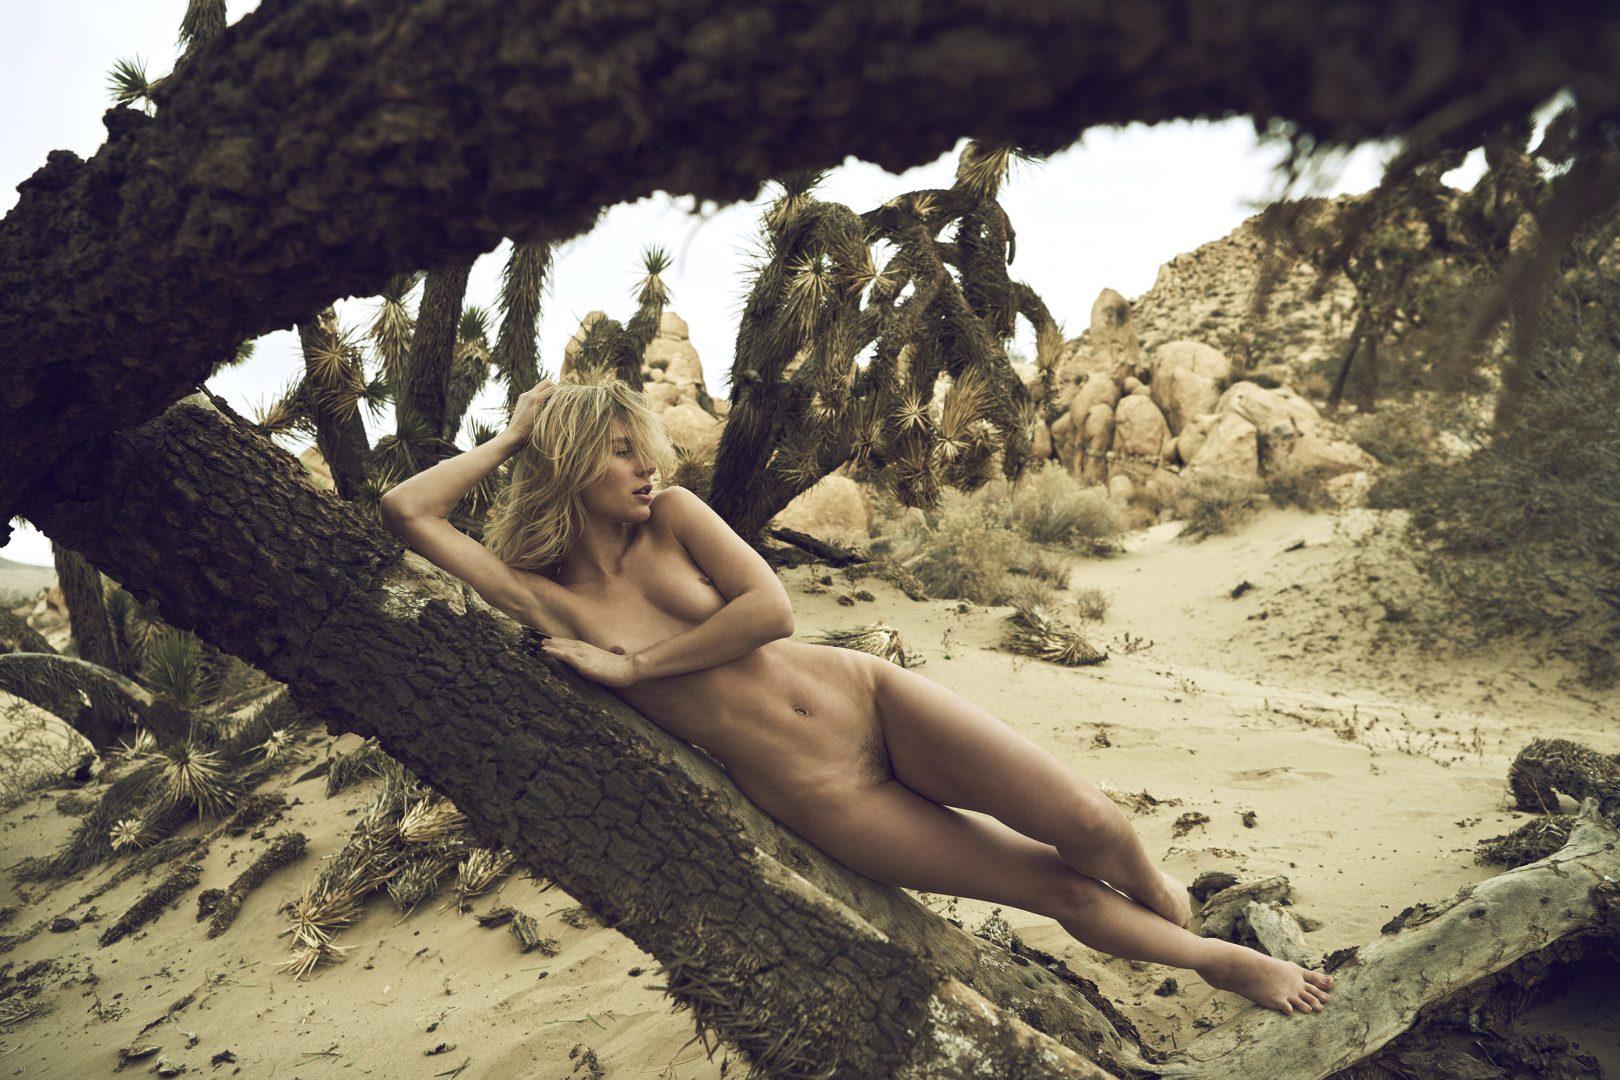 Naked girl lying on Joshua tree in the desert by Stefan Rappo